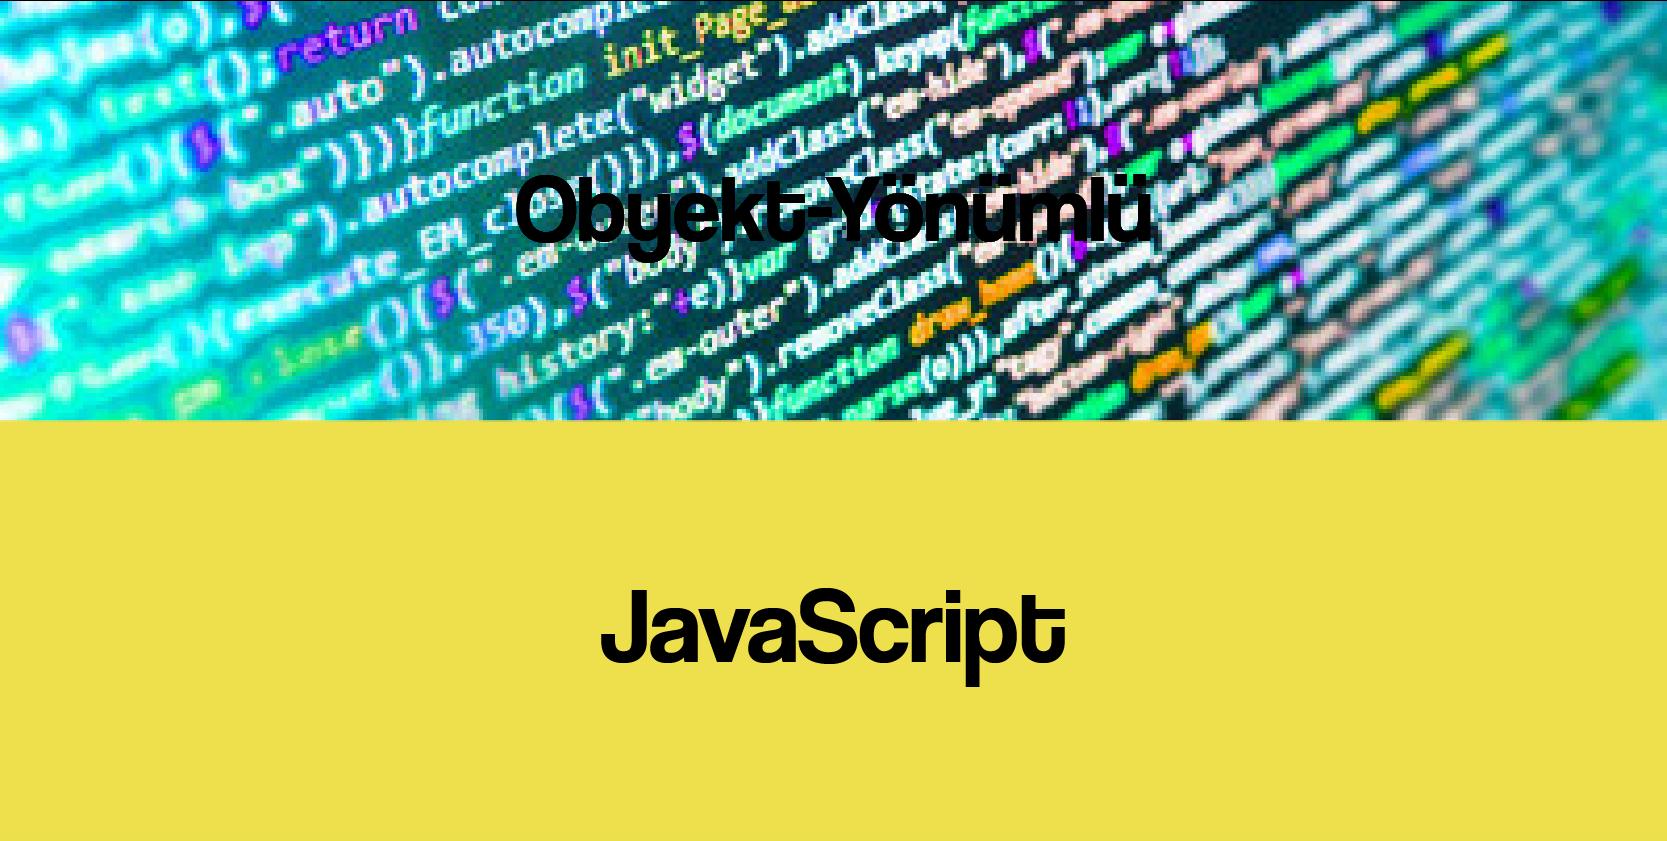 javascript proqramlasdirma dili